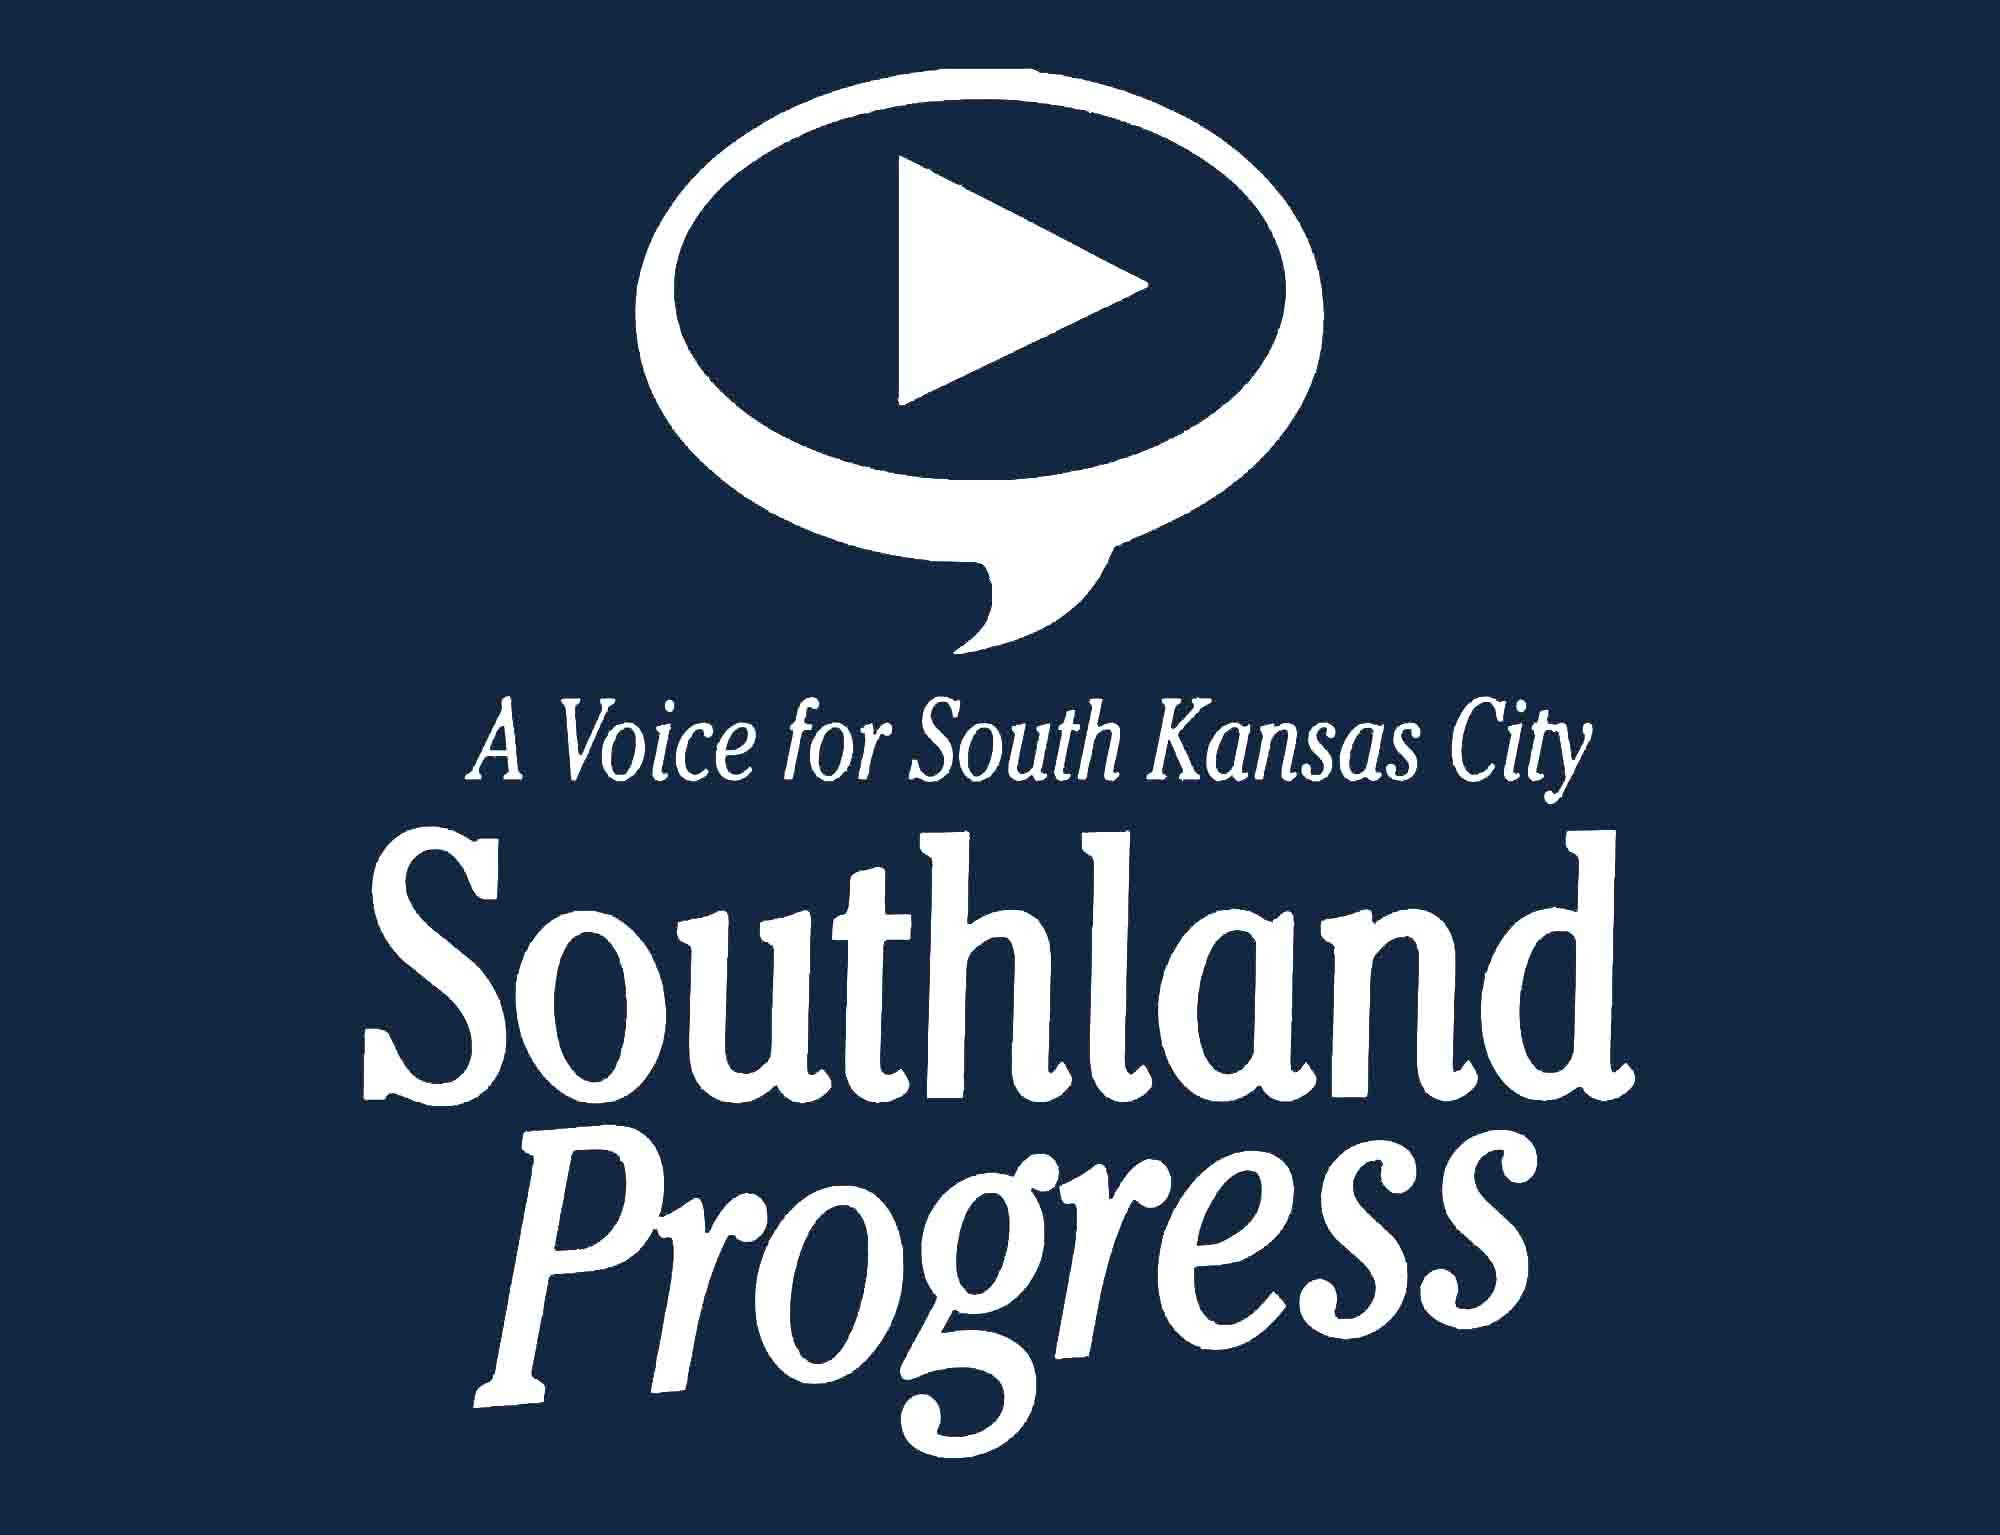 Southland Progress